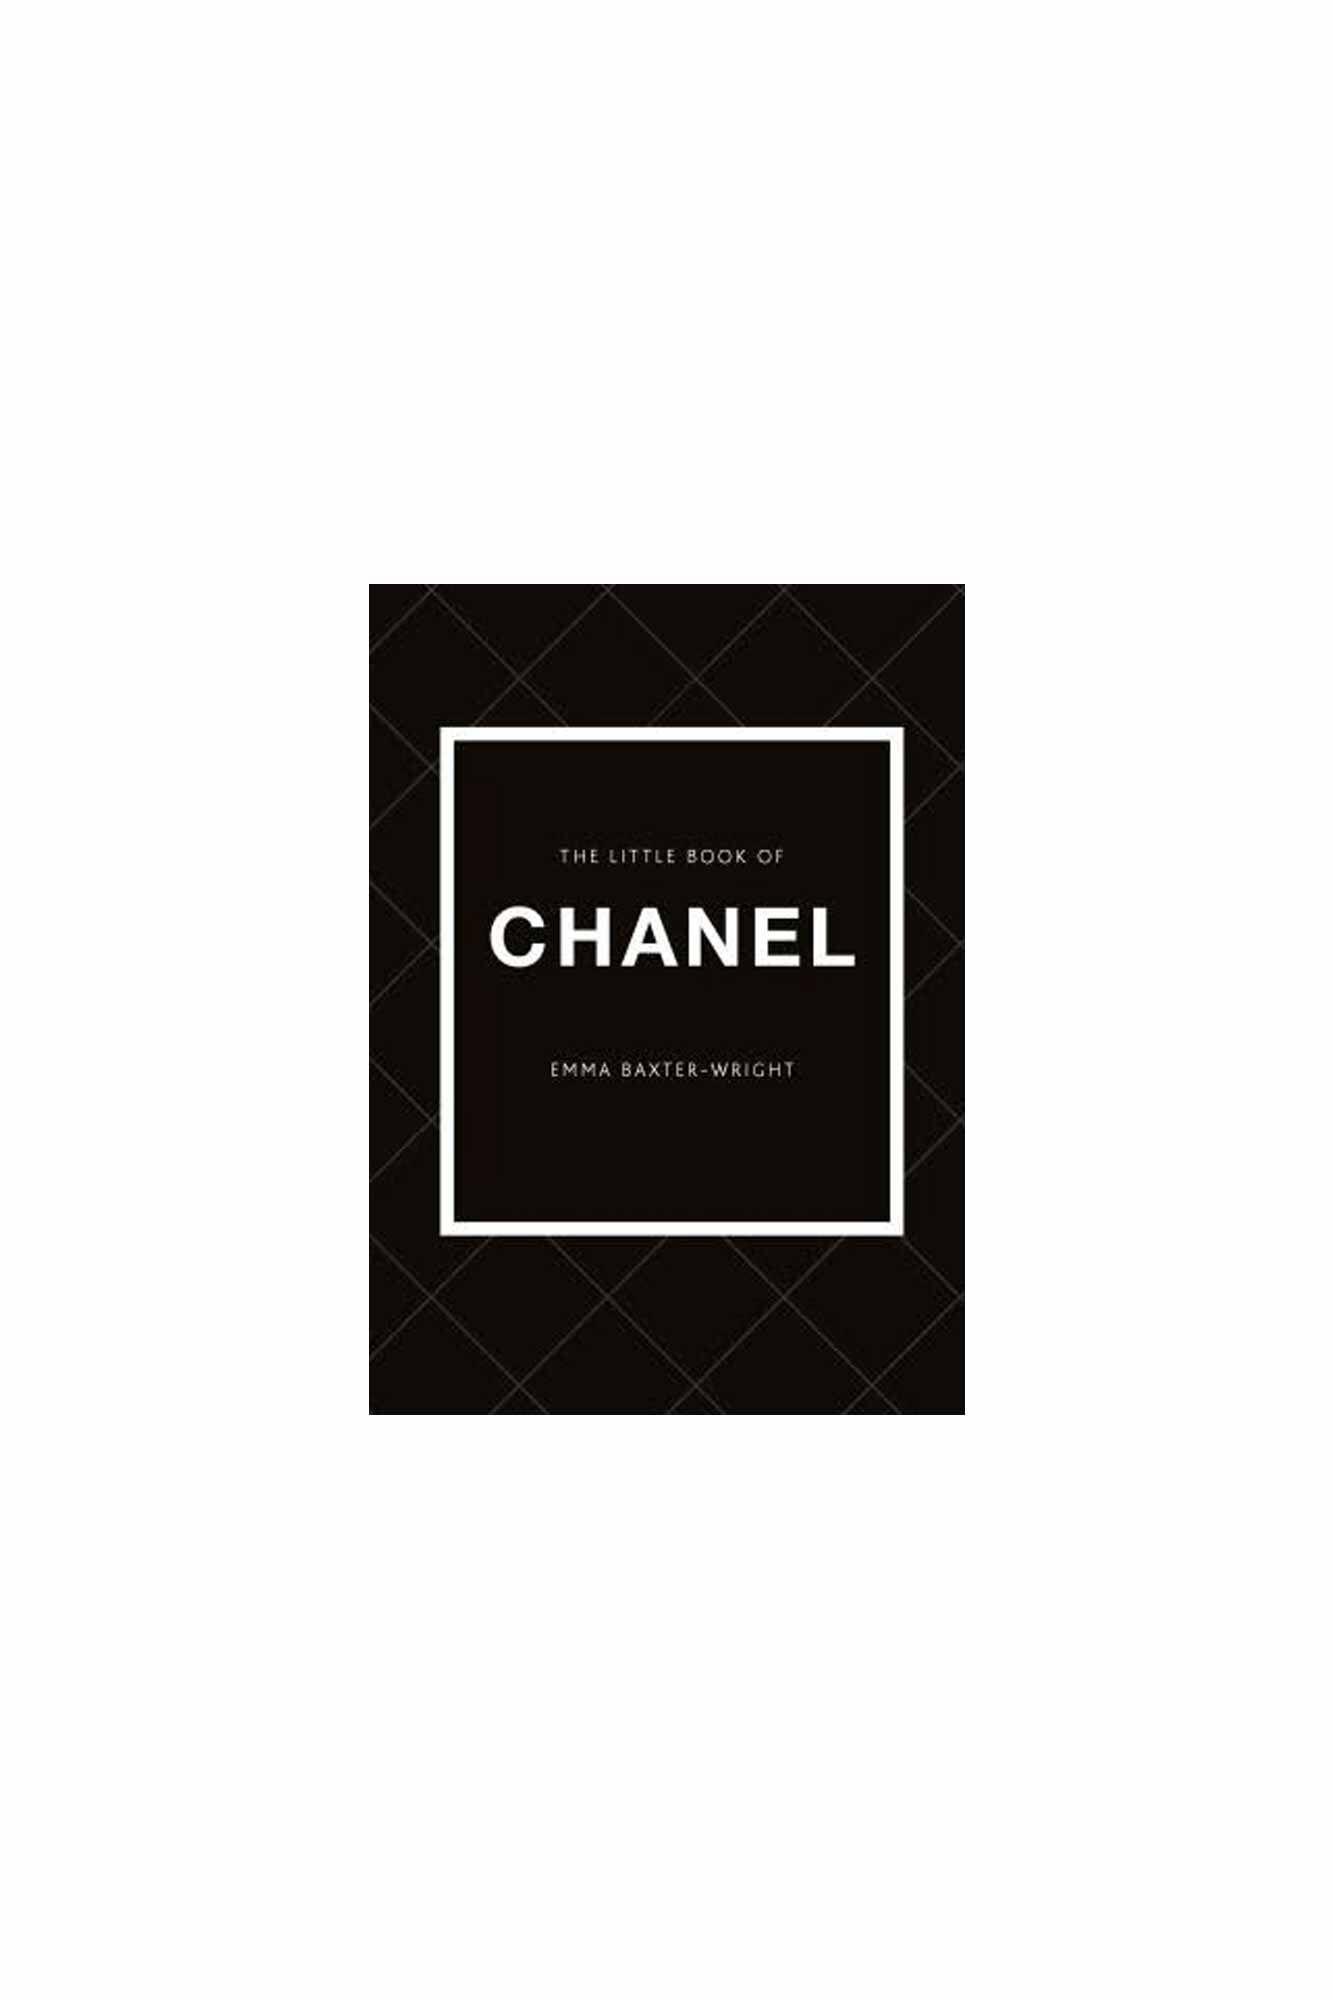 Little book of chanel CB1000, MULTIPLE